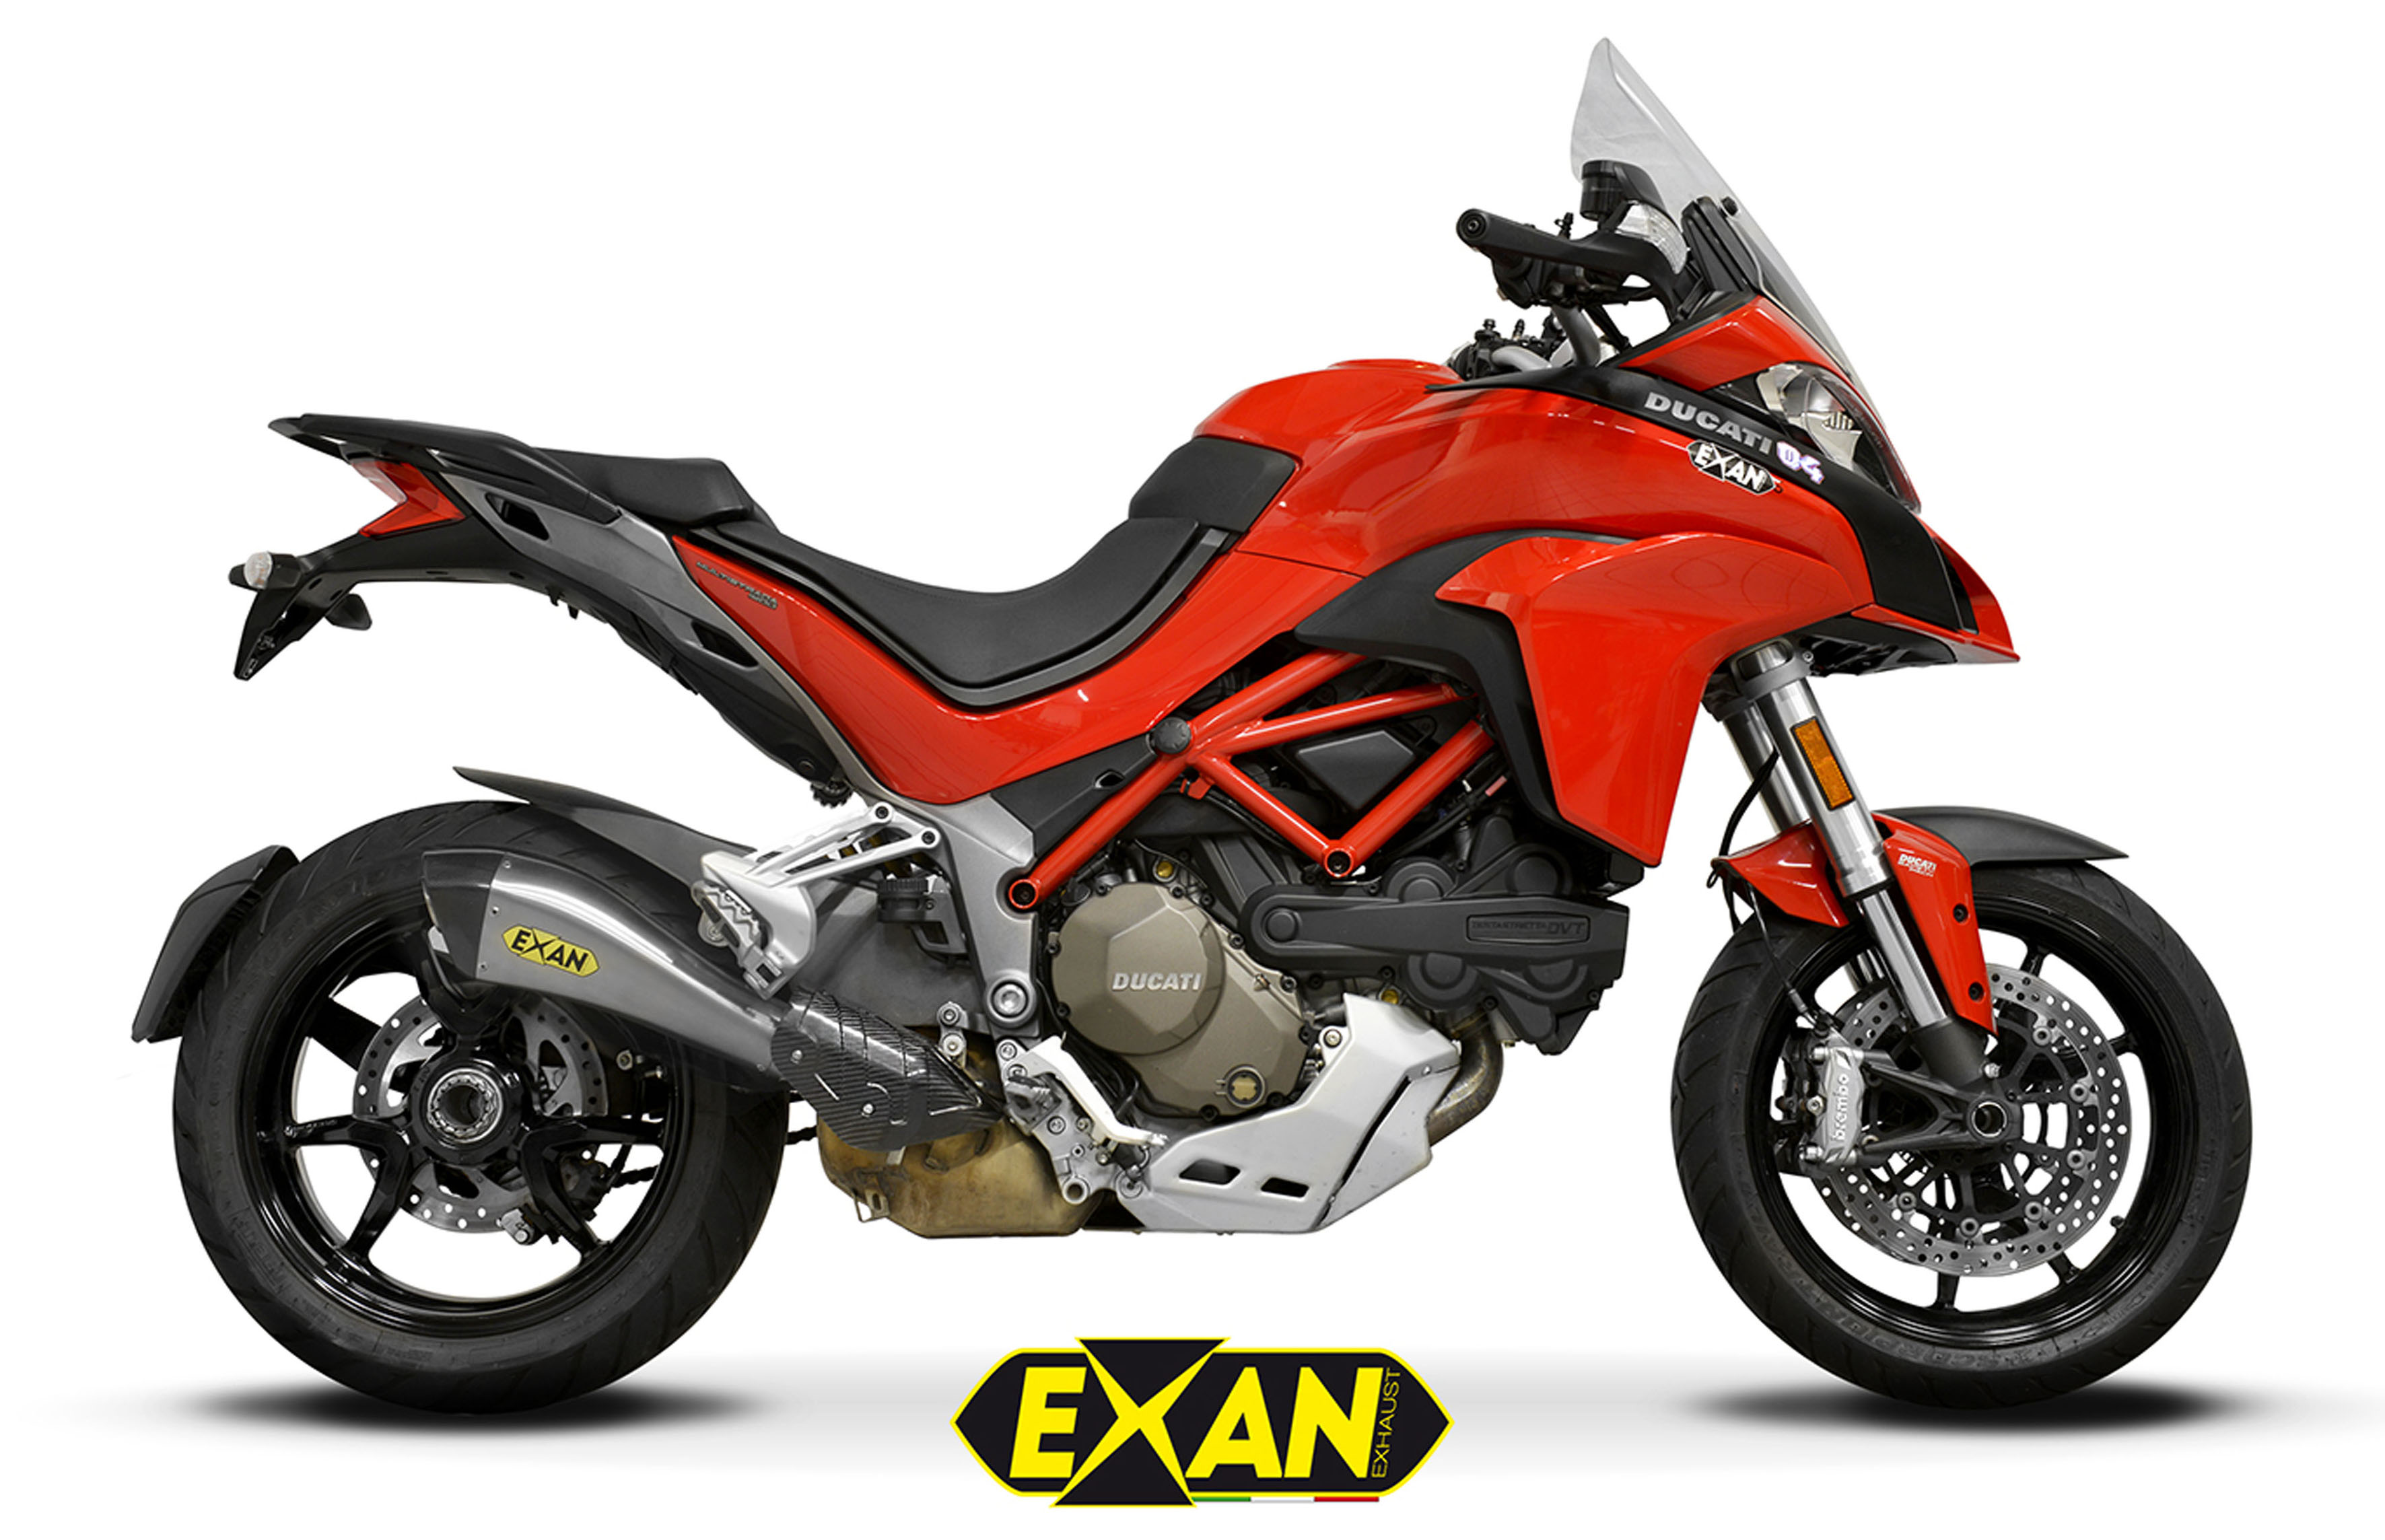 Ducati Multistrada 1200 EXAN